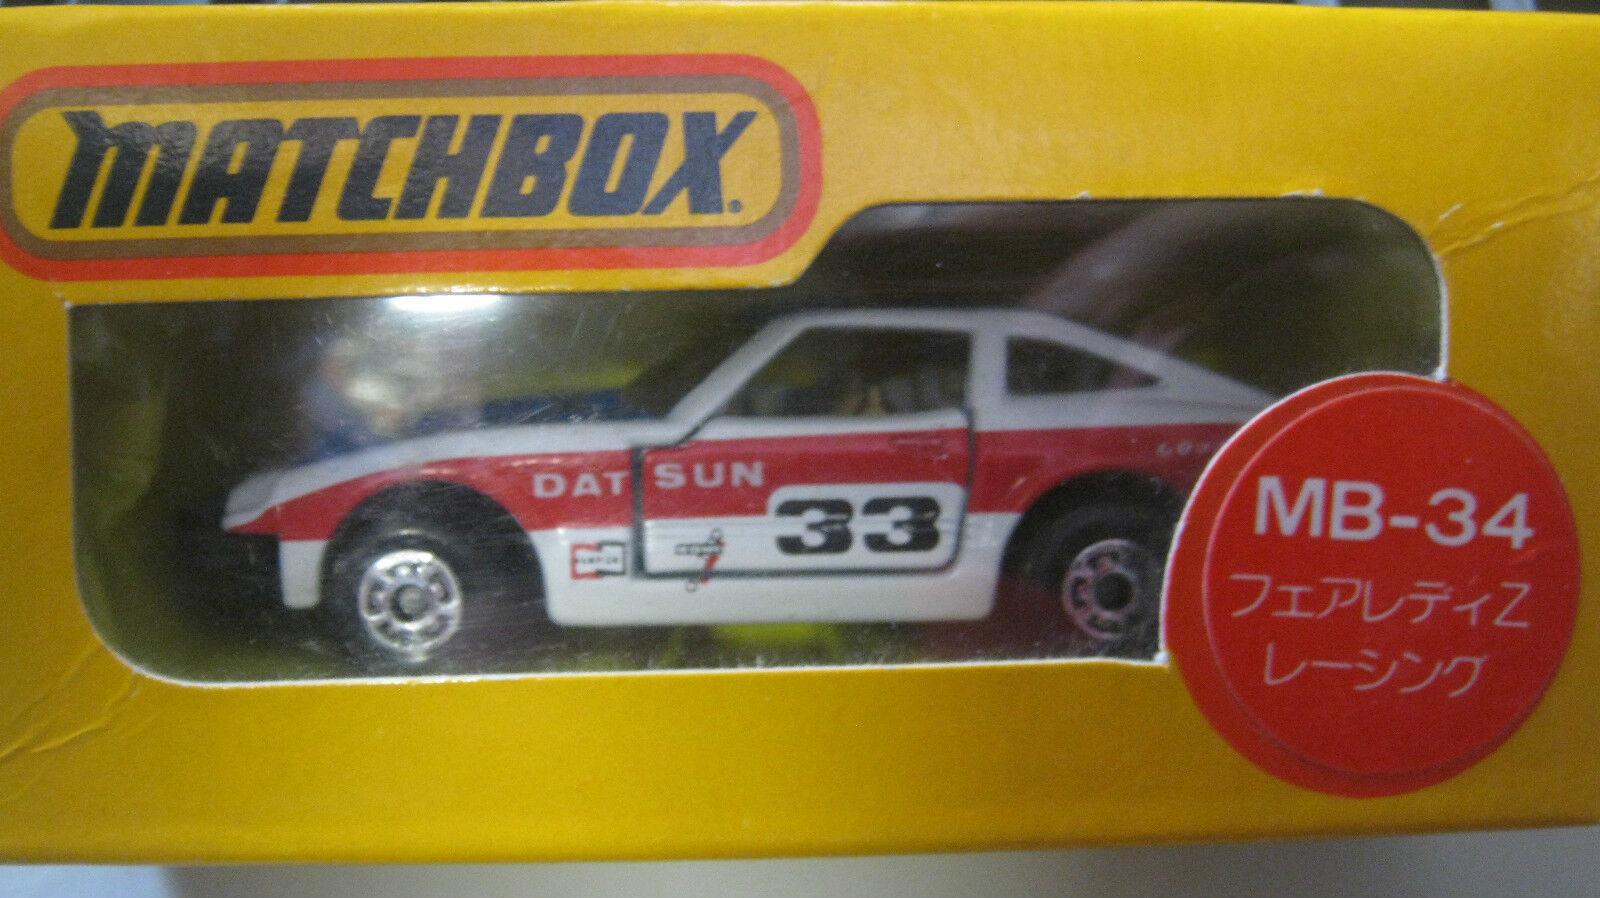 1/64 Matchbox Japón Datsun 33 Race Car